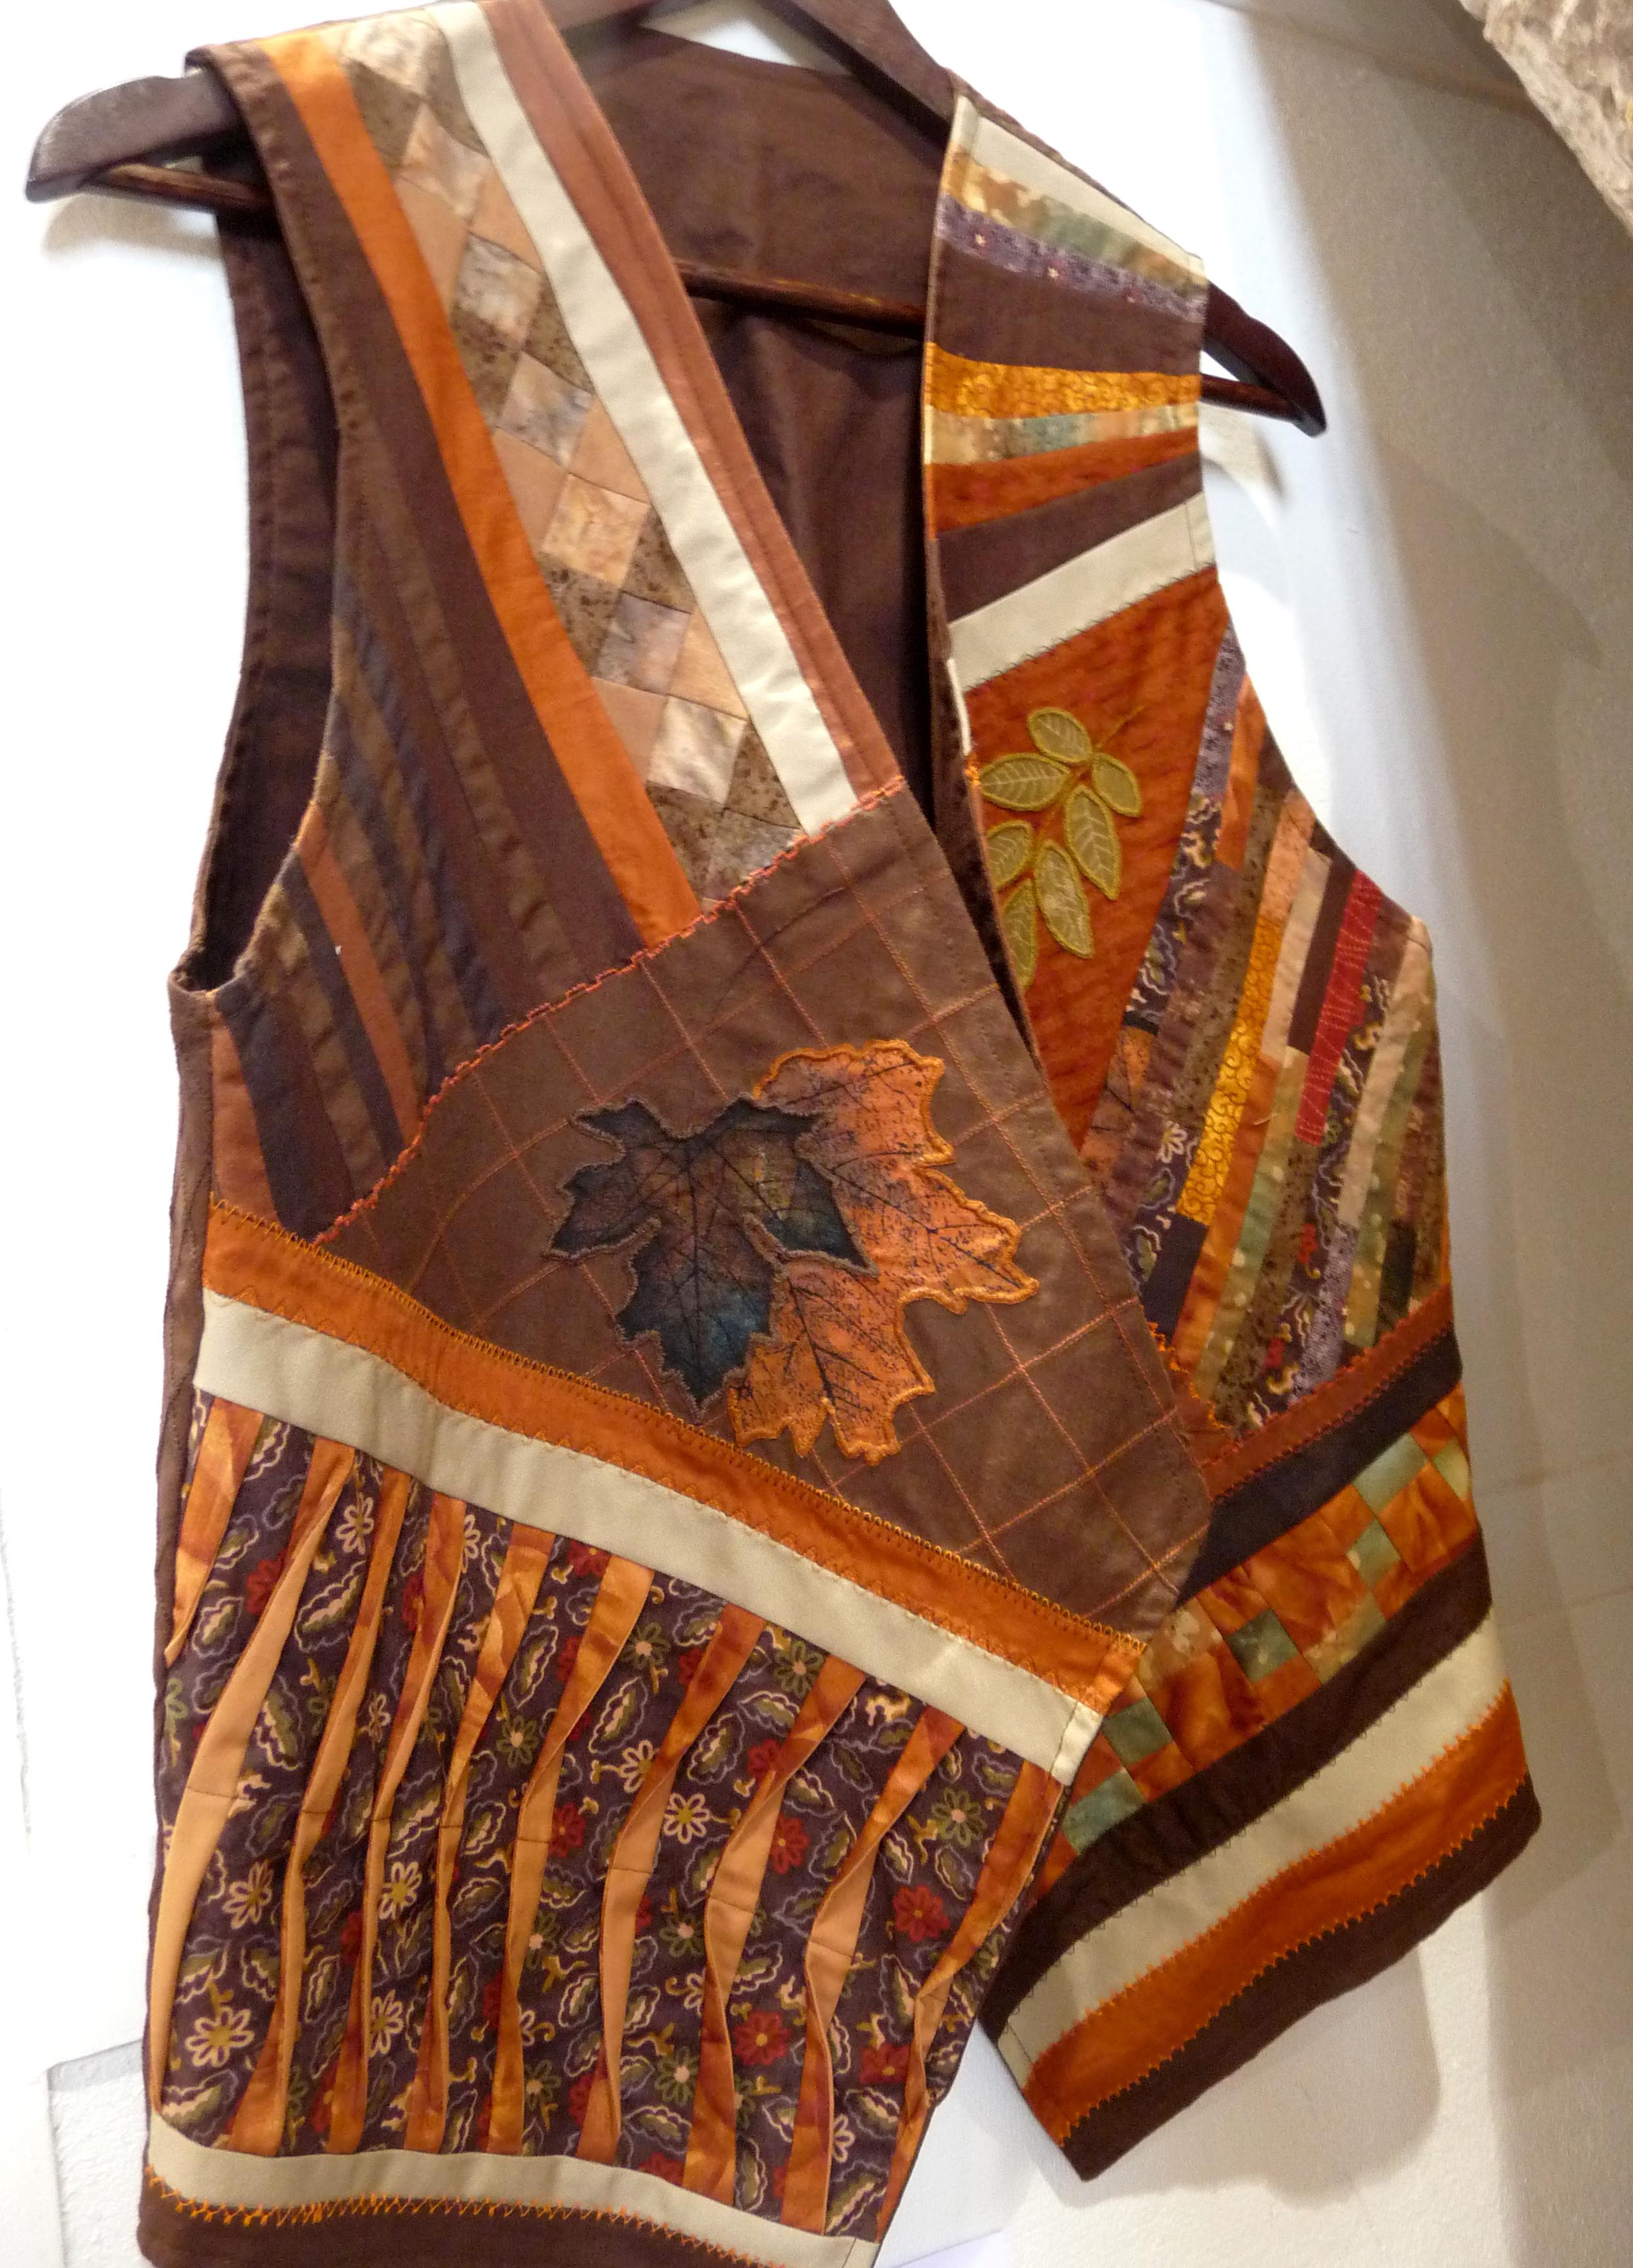 WAISTCOAT 2 by Brenda Baxter, random log cabin patchwork